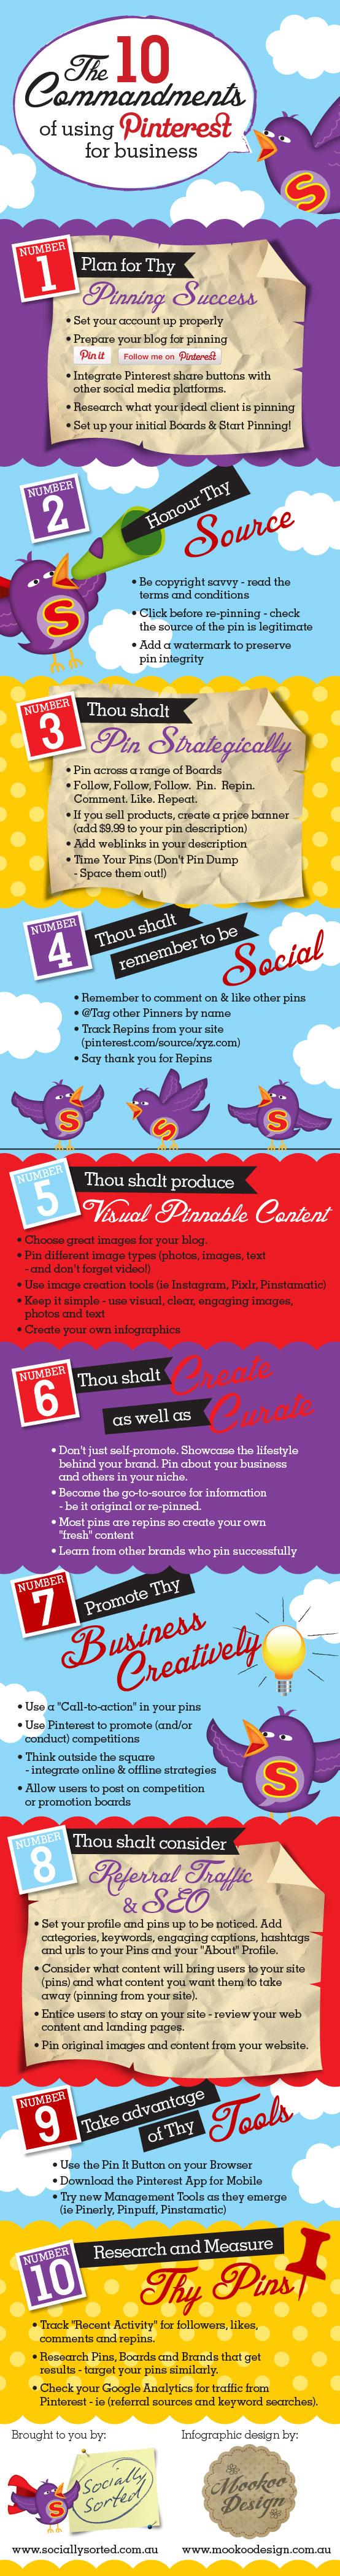 Using Pinterest for business 10 commandments